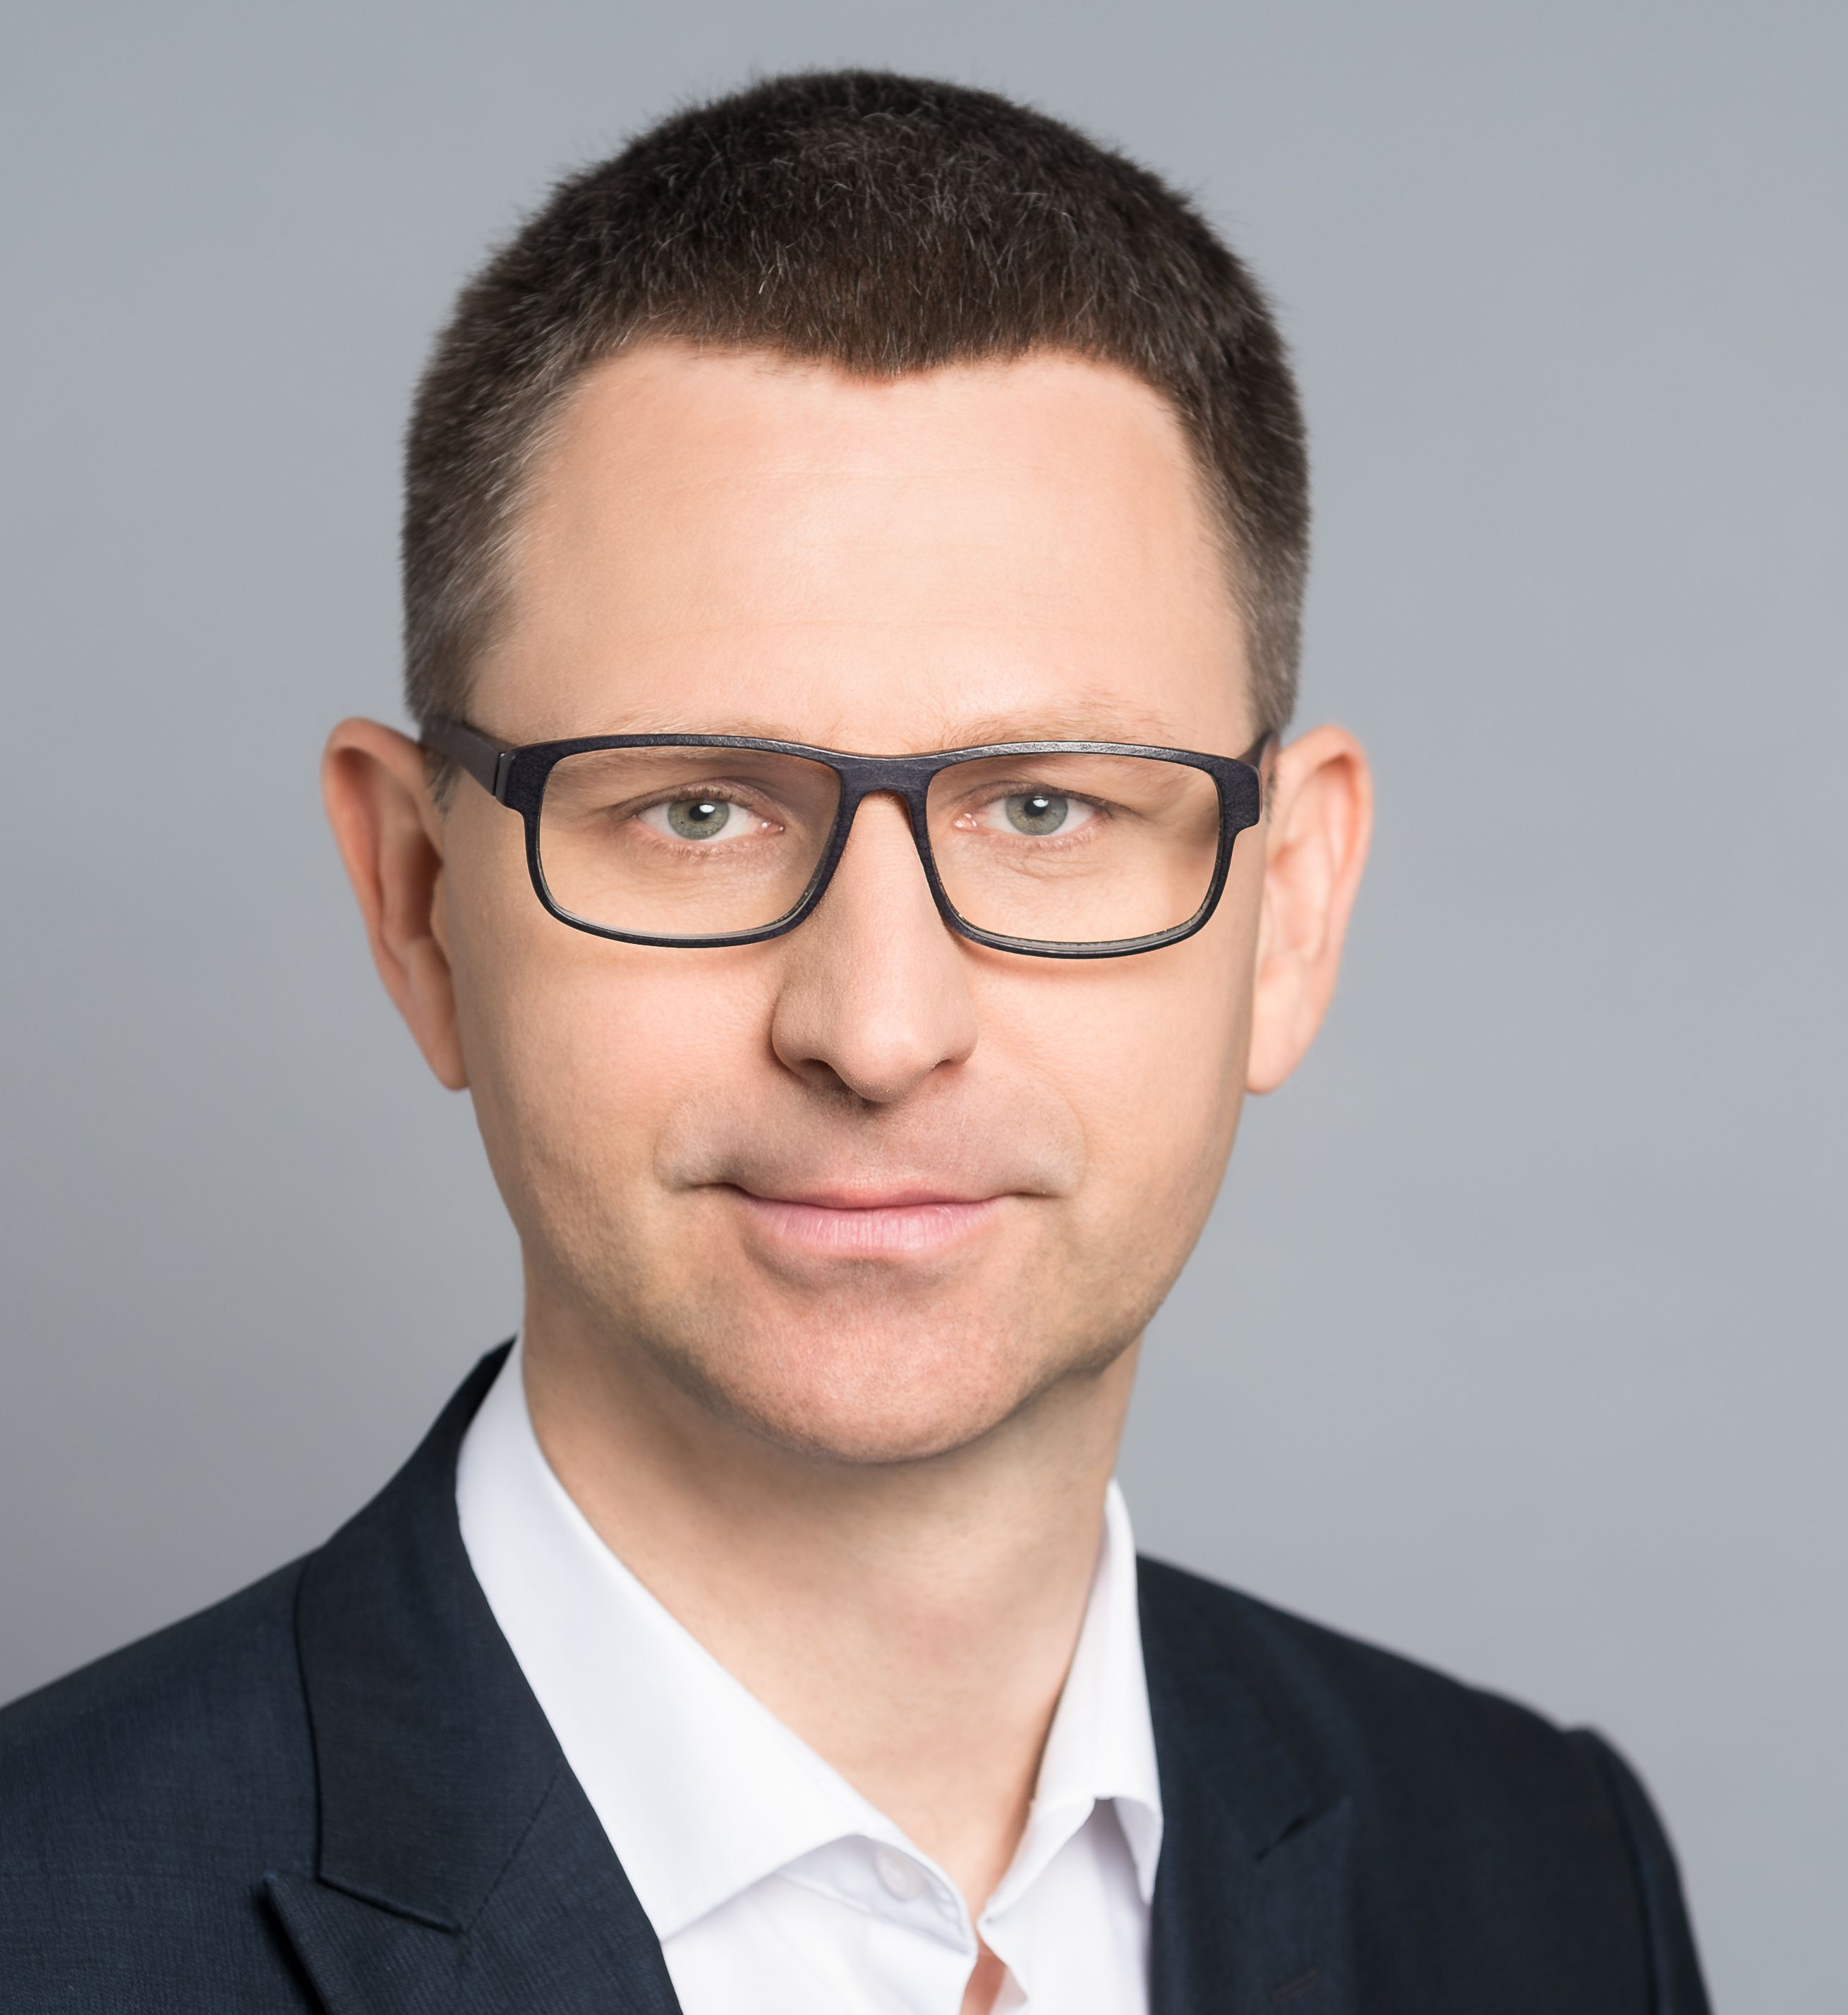 Piotr Rogowski z Lidlem związany od 20 lat (Fot. mat. pras.)